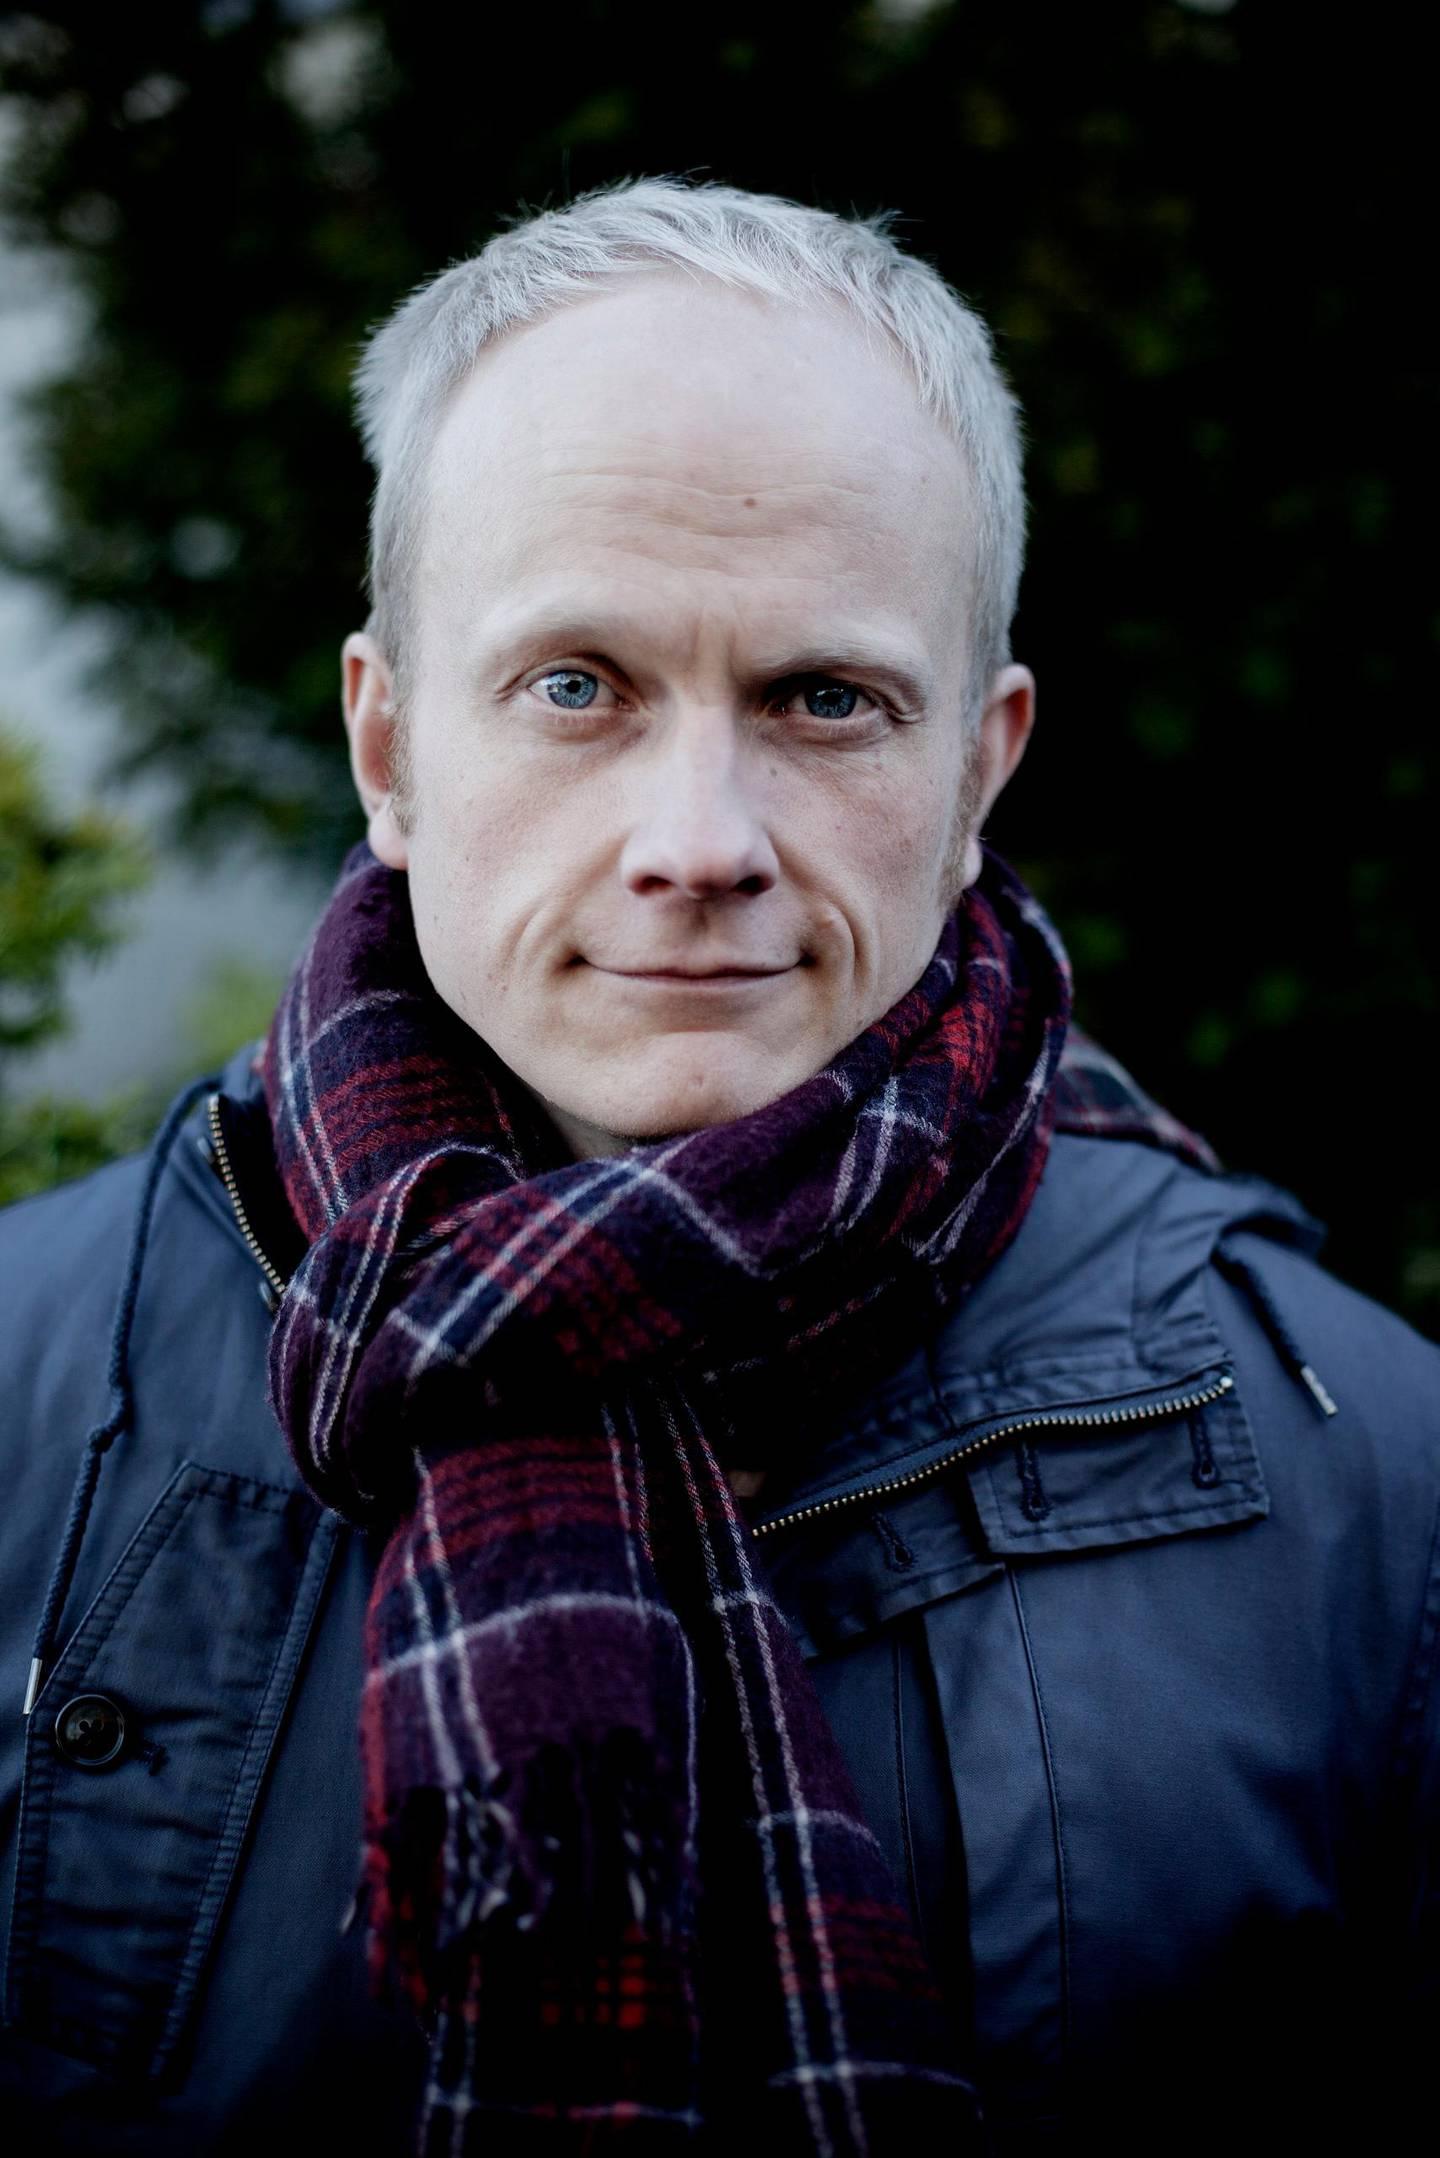 Reportasje om selvhjelpsbøker, mindfullness. Ole Jacob Madsen.  Foto: Hilde Unosen